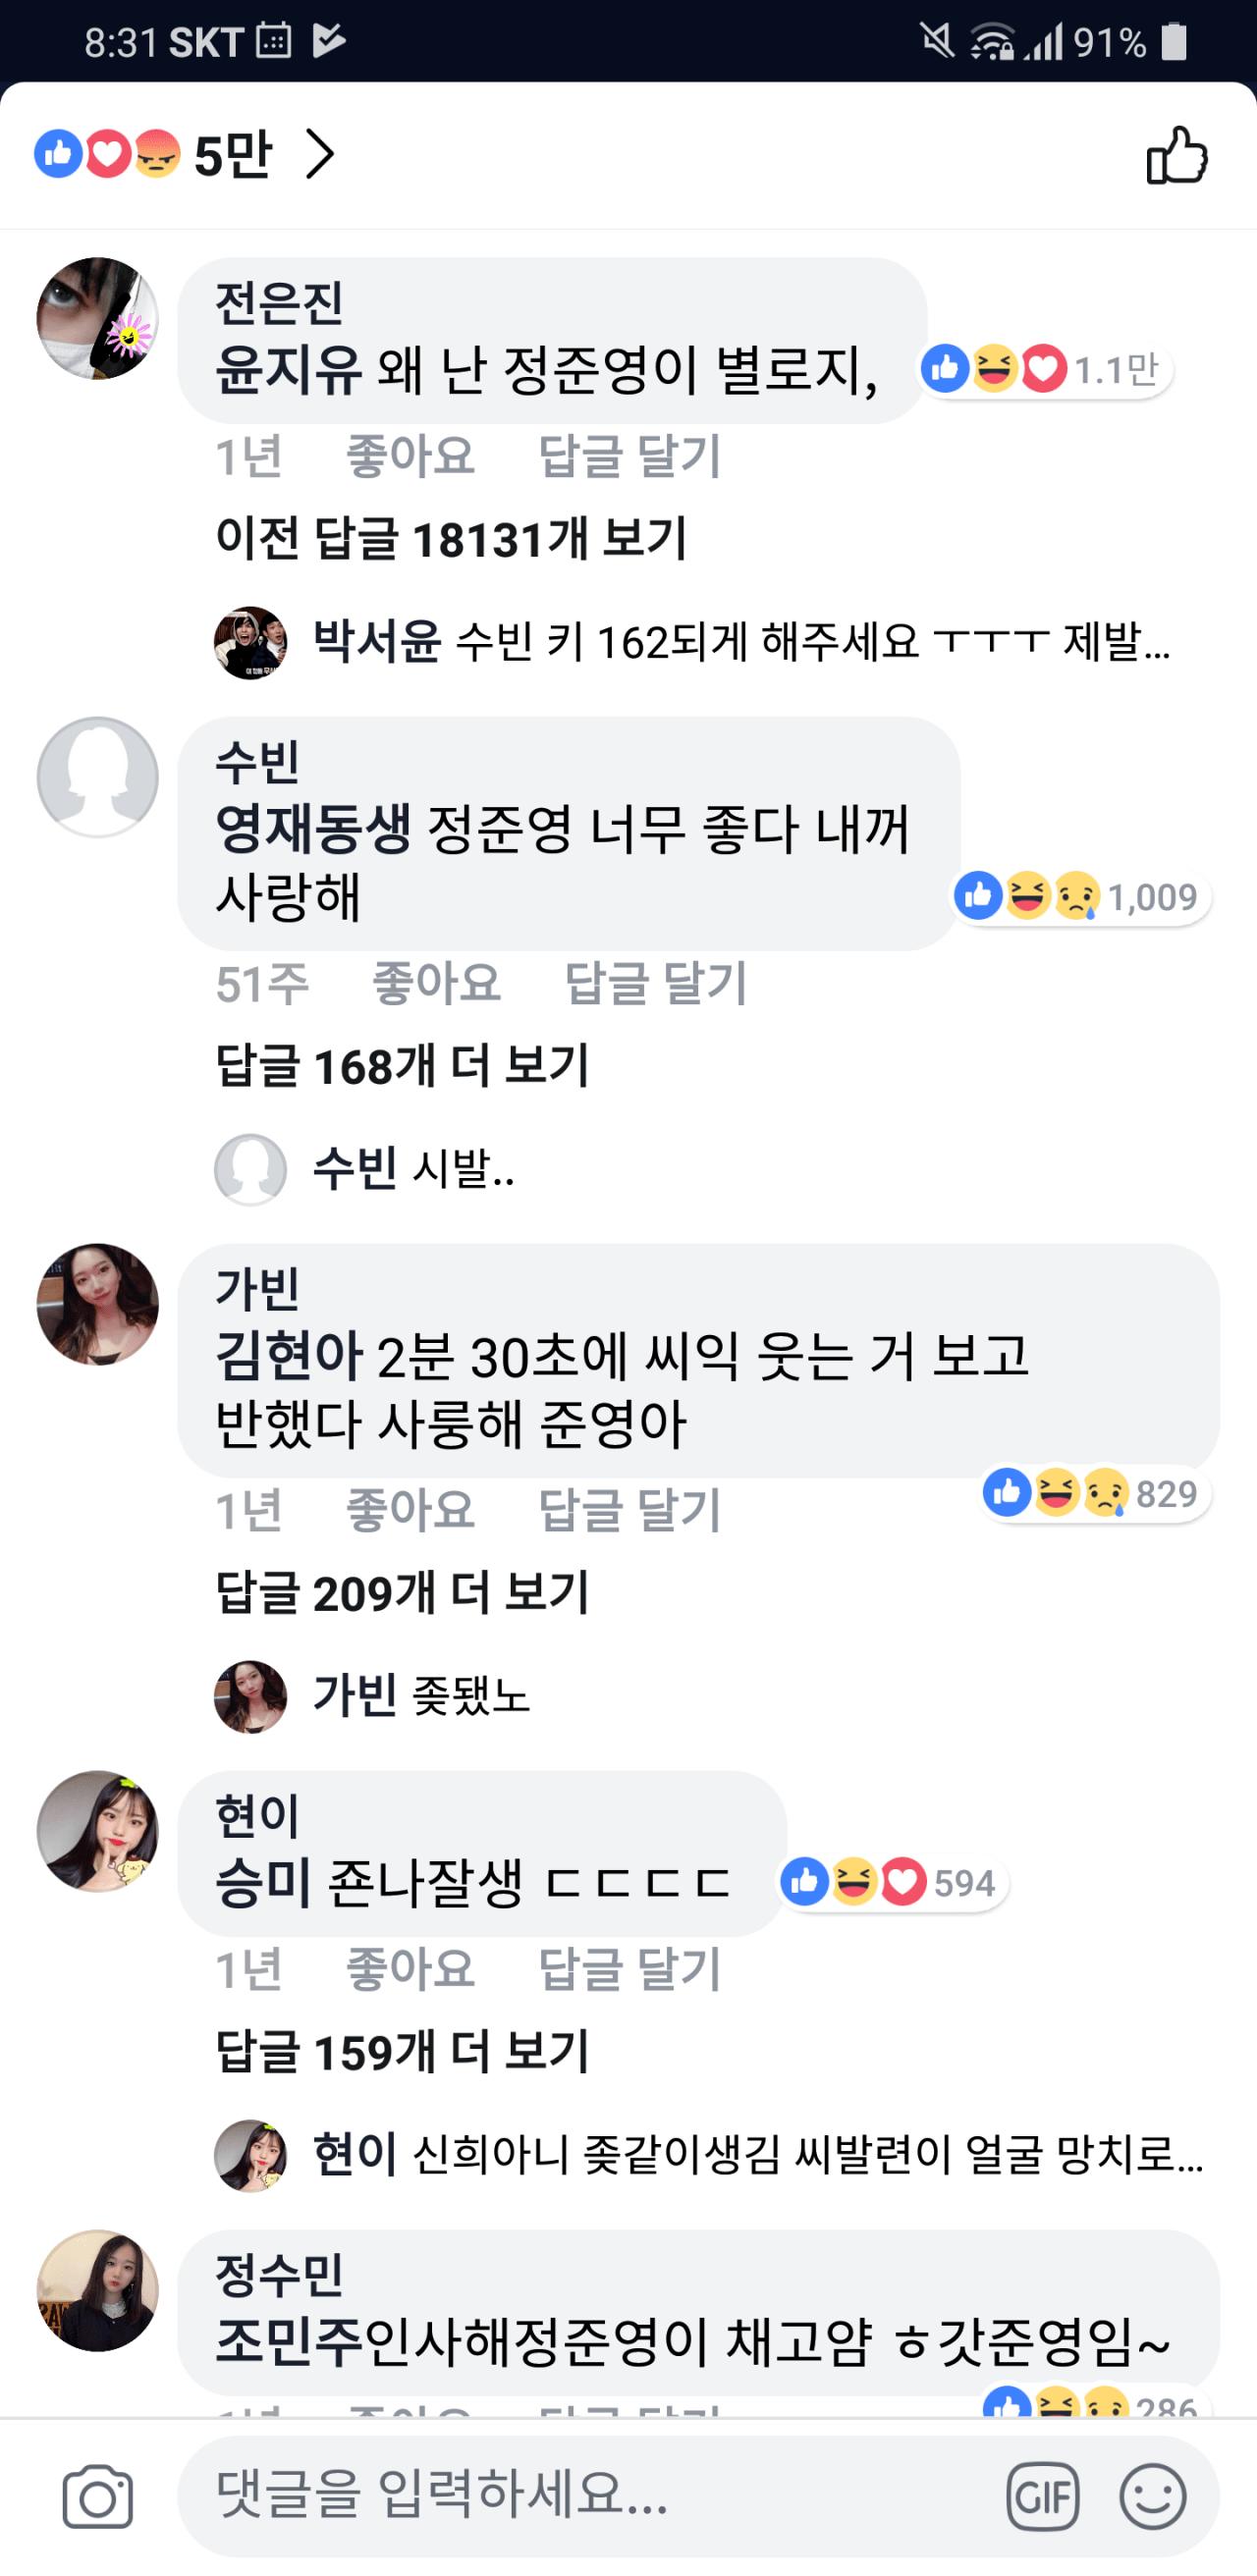 Capture+_2019-03-16-08-31-27.png 정준영 팬들 근황